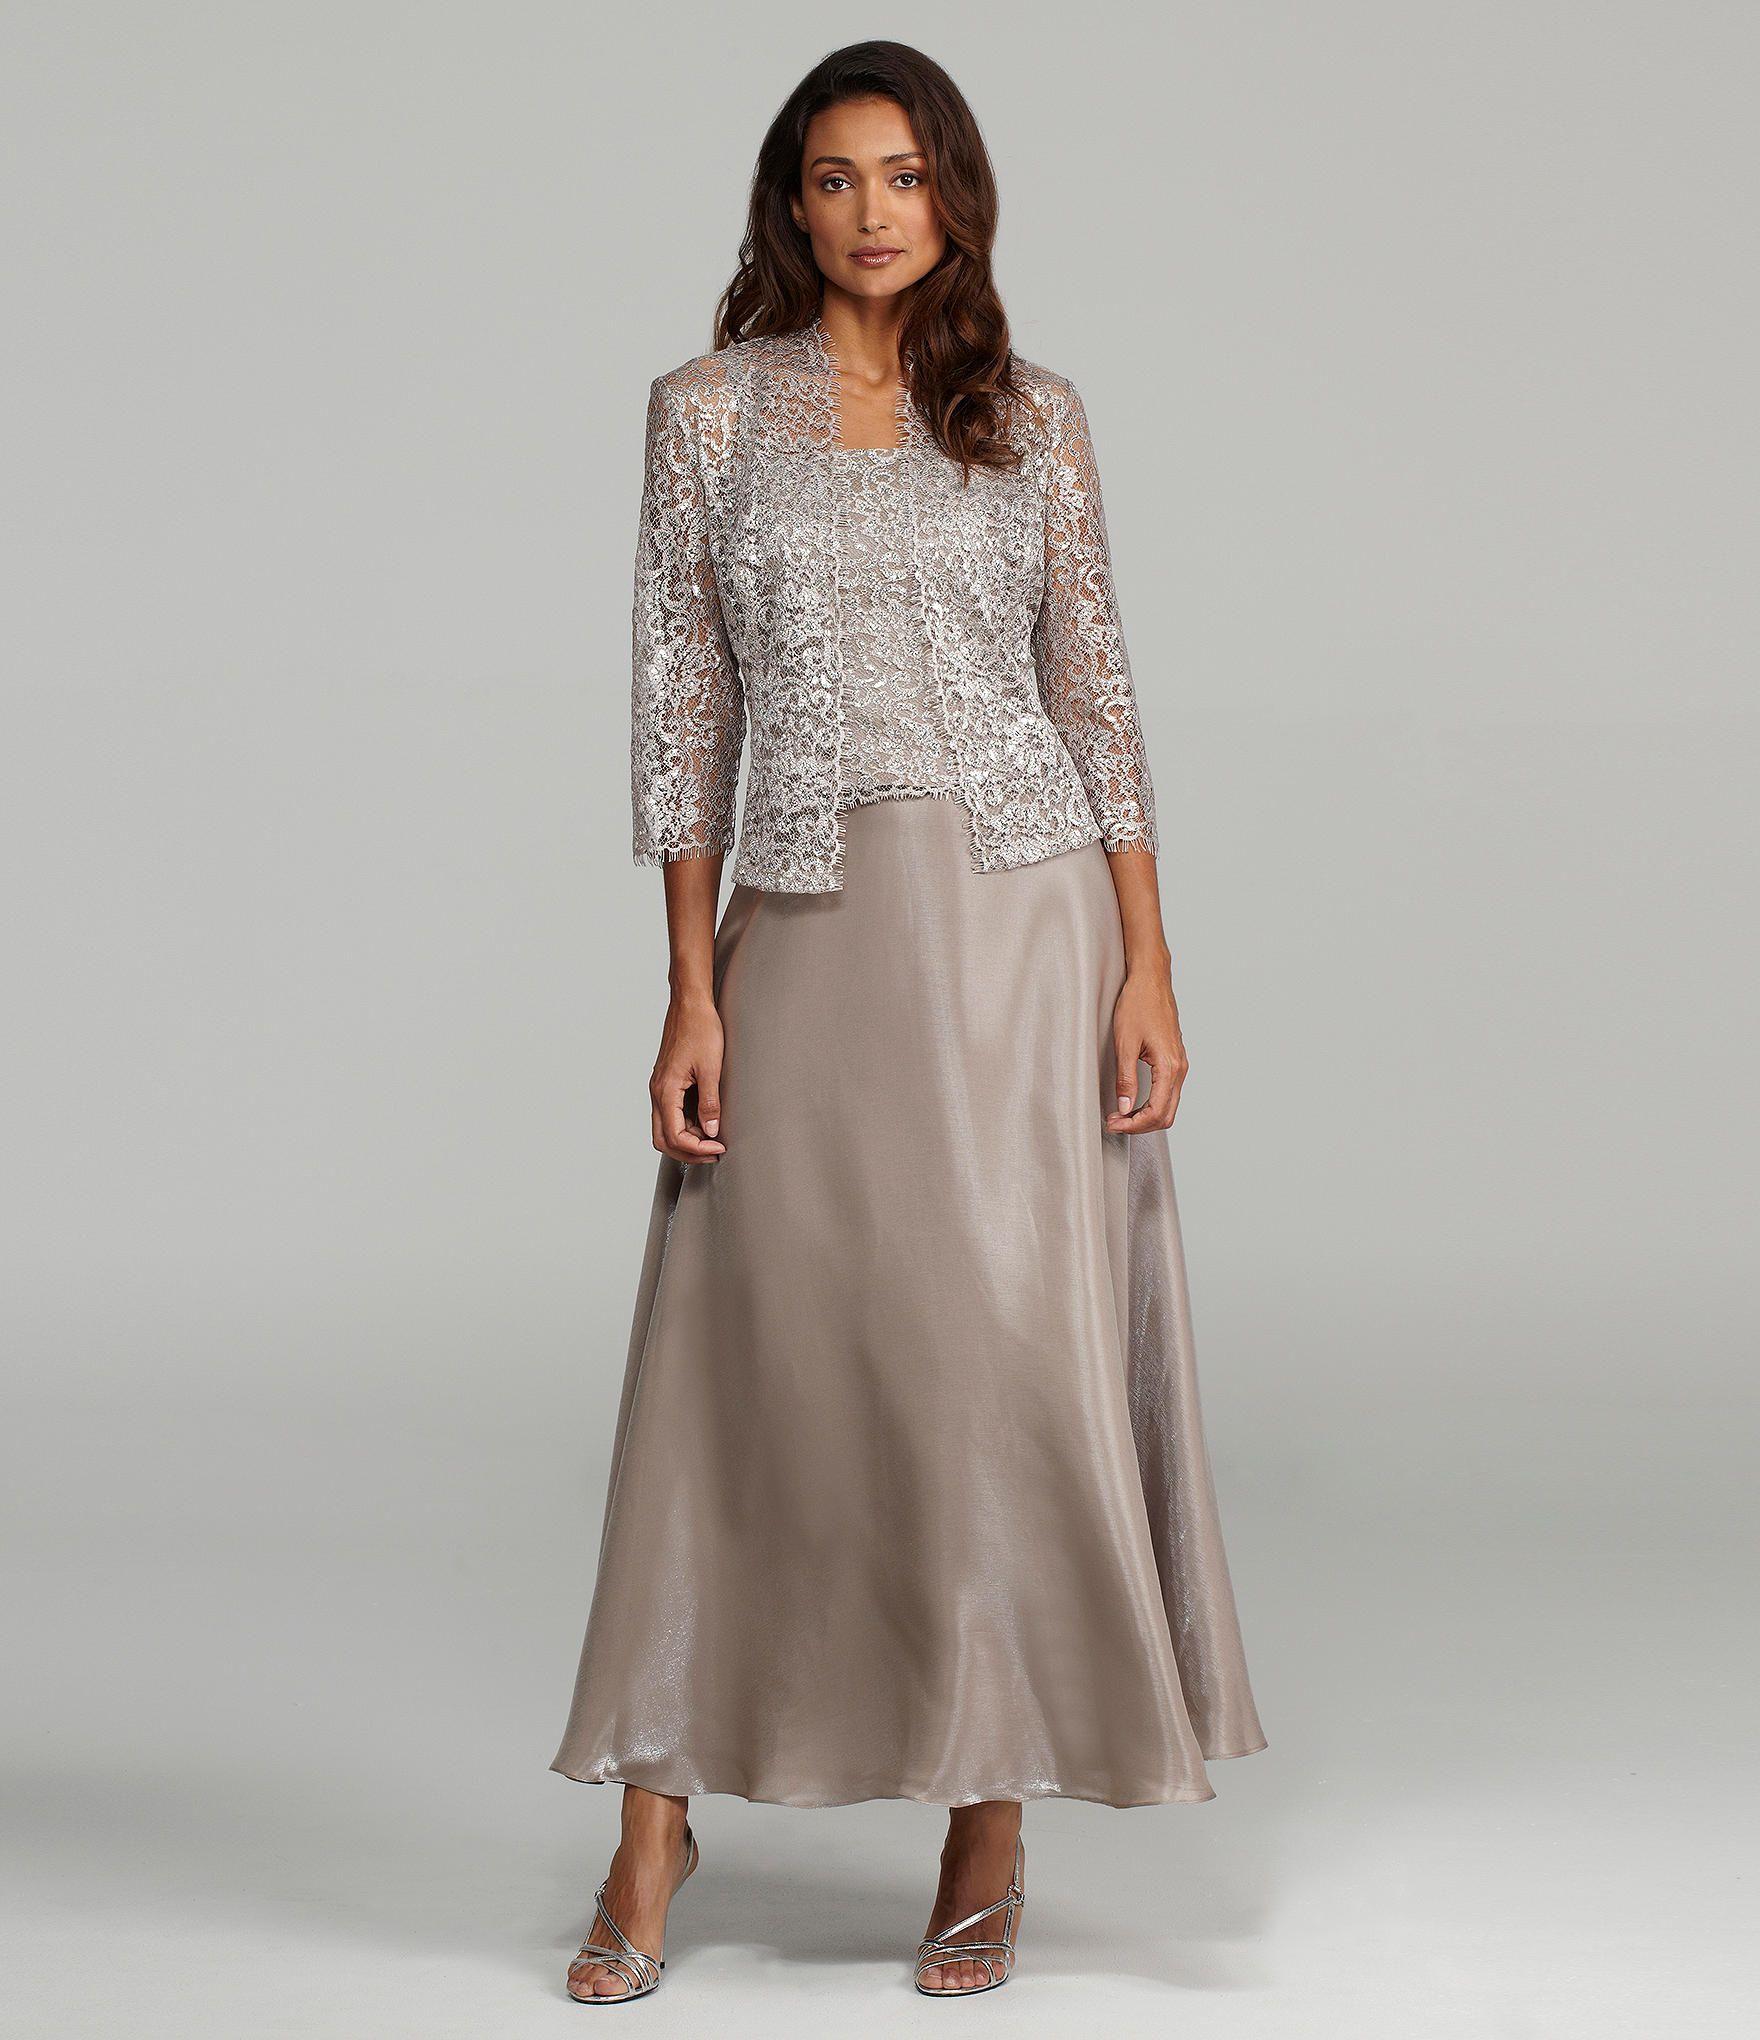 Km Collections Woman Lace Jacket Dress Dillards